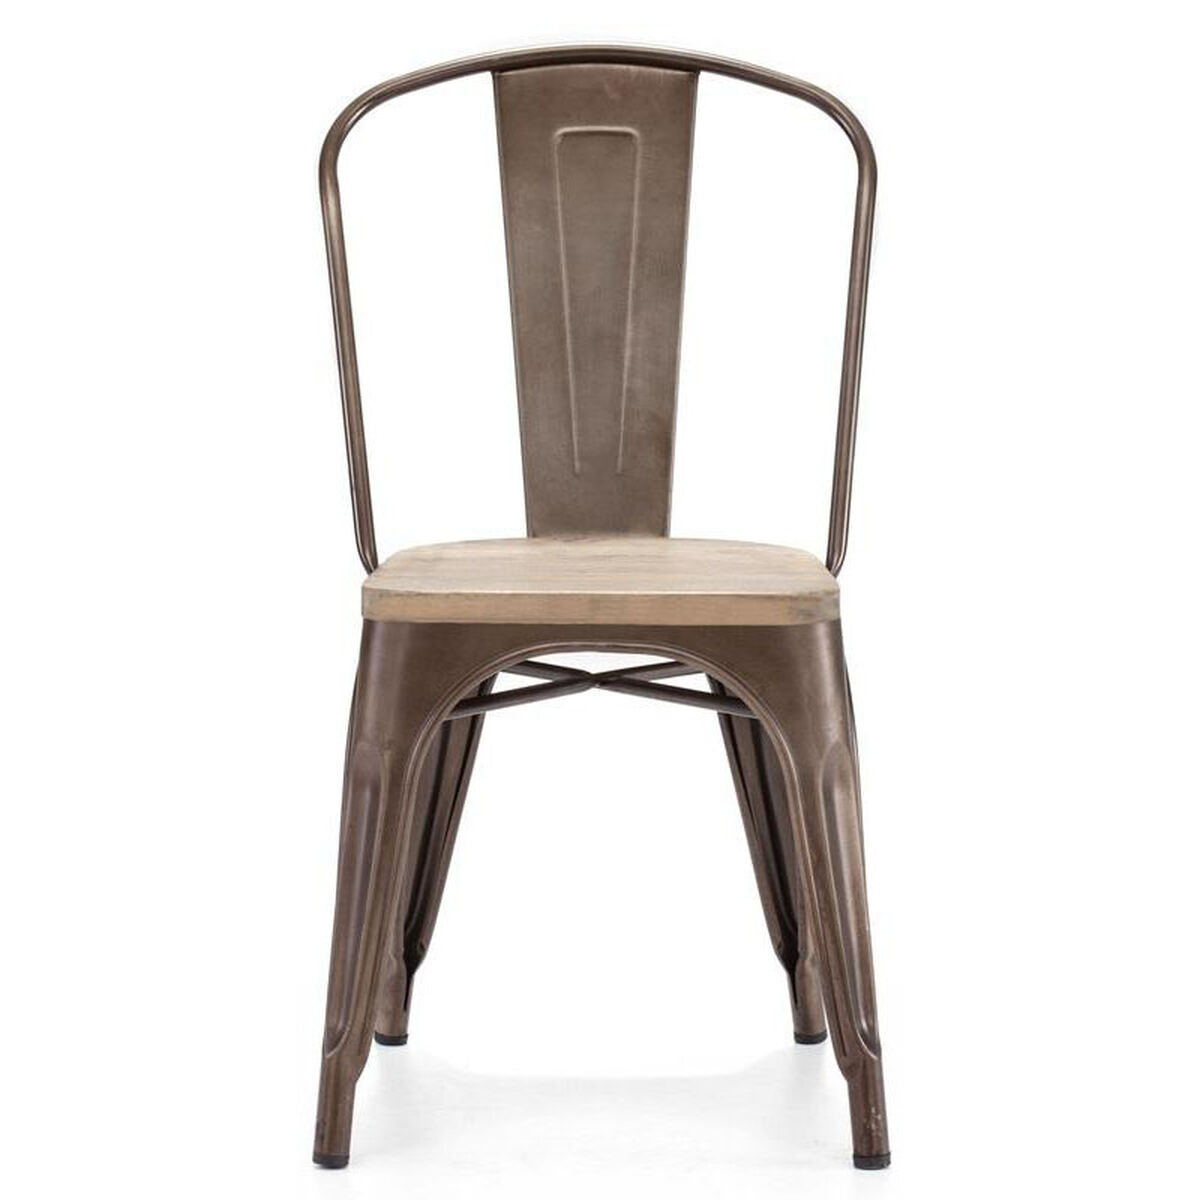 dreux stackable rustic matte steel side chair with light elm wood seat set of 4 inset 2. Black Bedroom Furniture Sets. Home Design Ideas